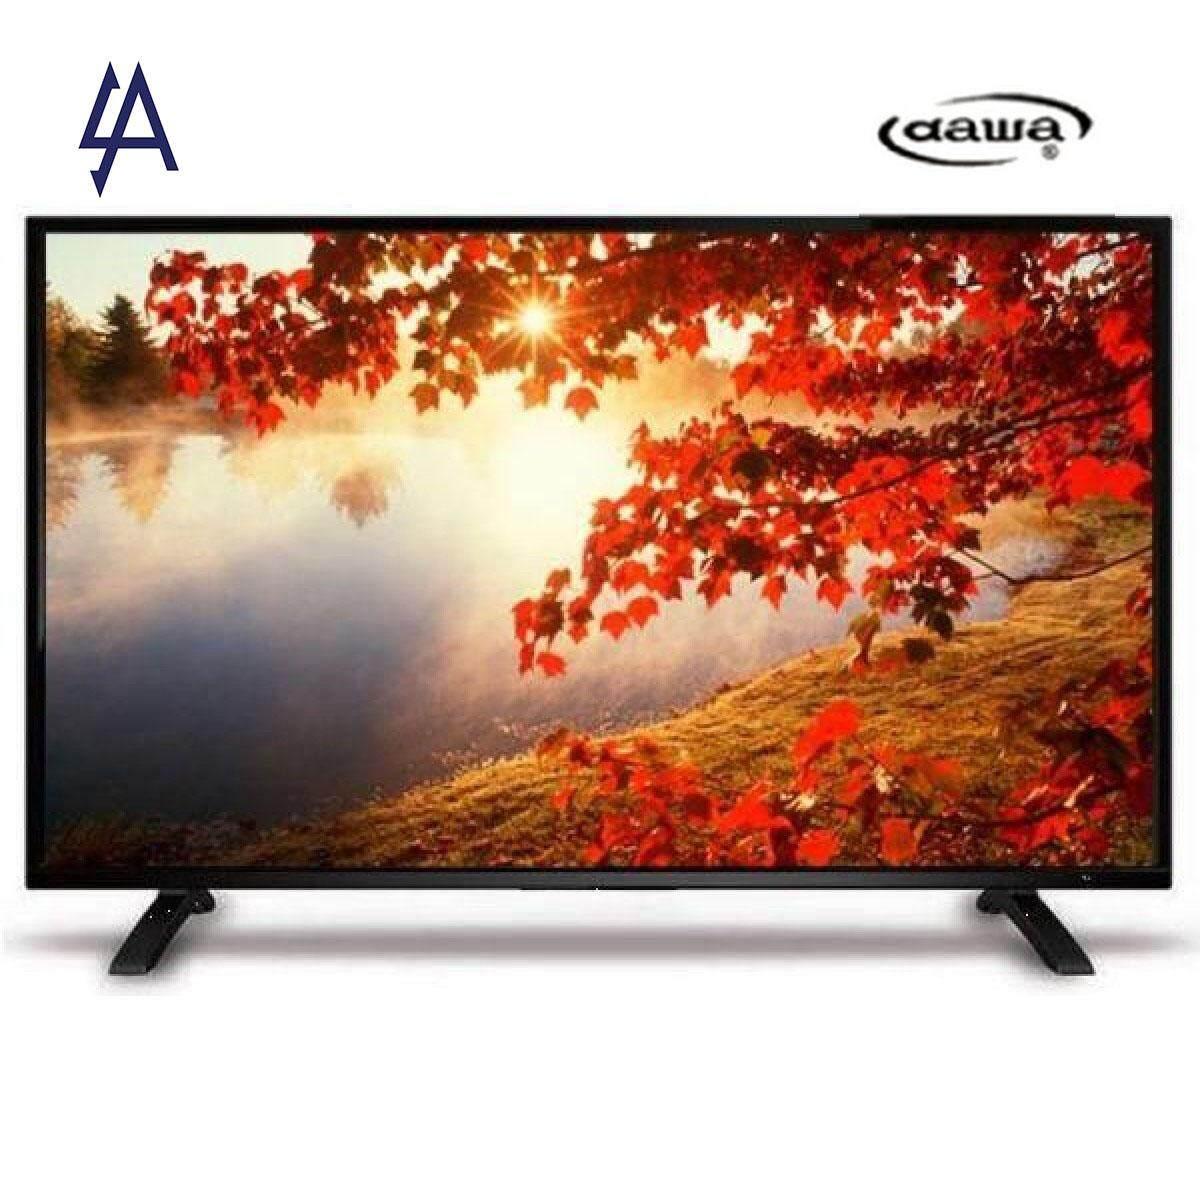 Dawa Malaysia HD DVB-T2 LED-3233UT Digital Led TV